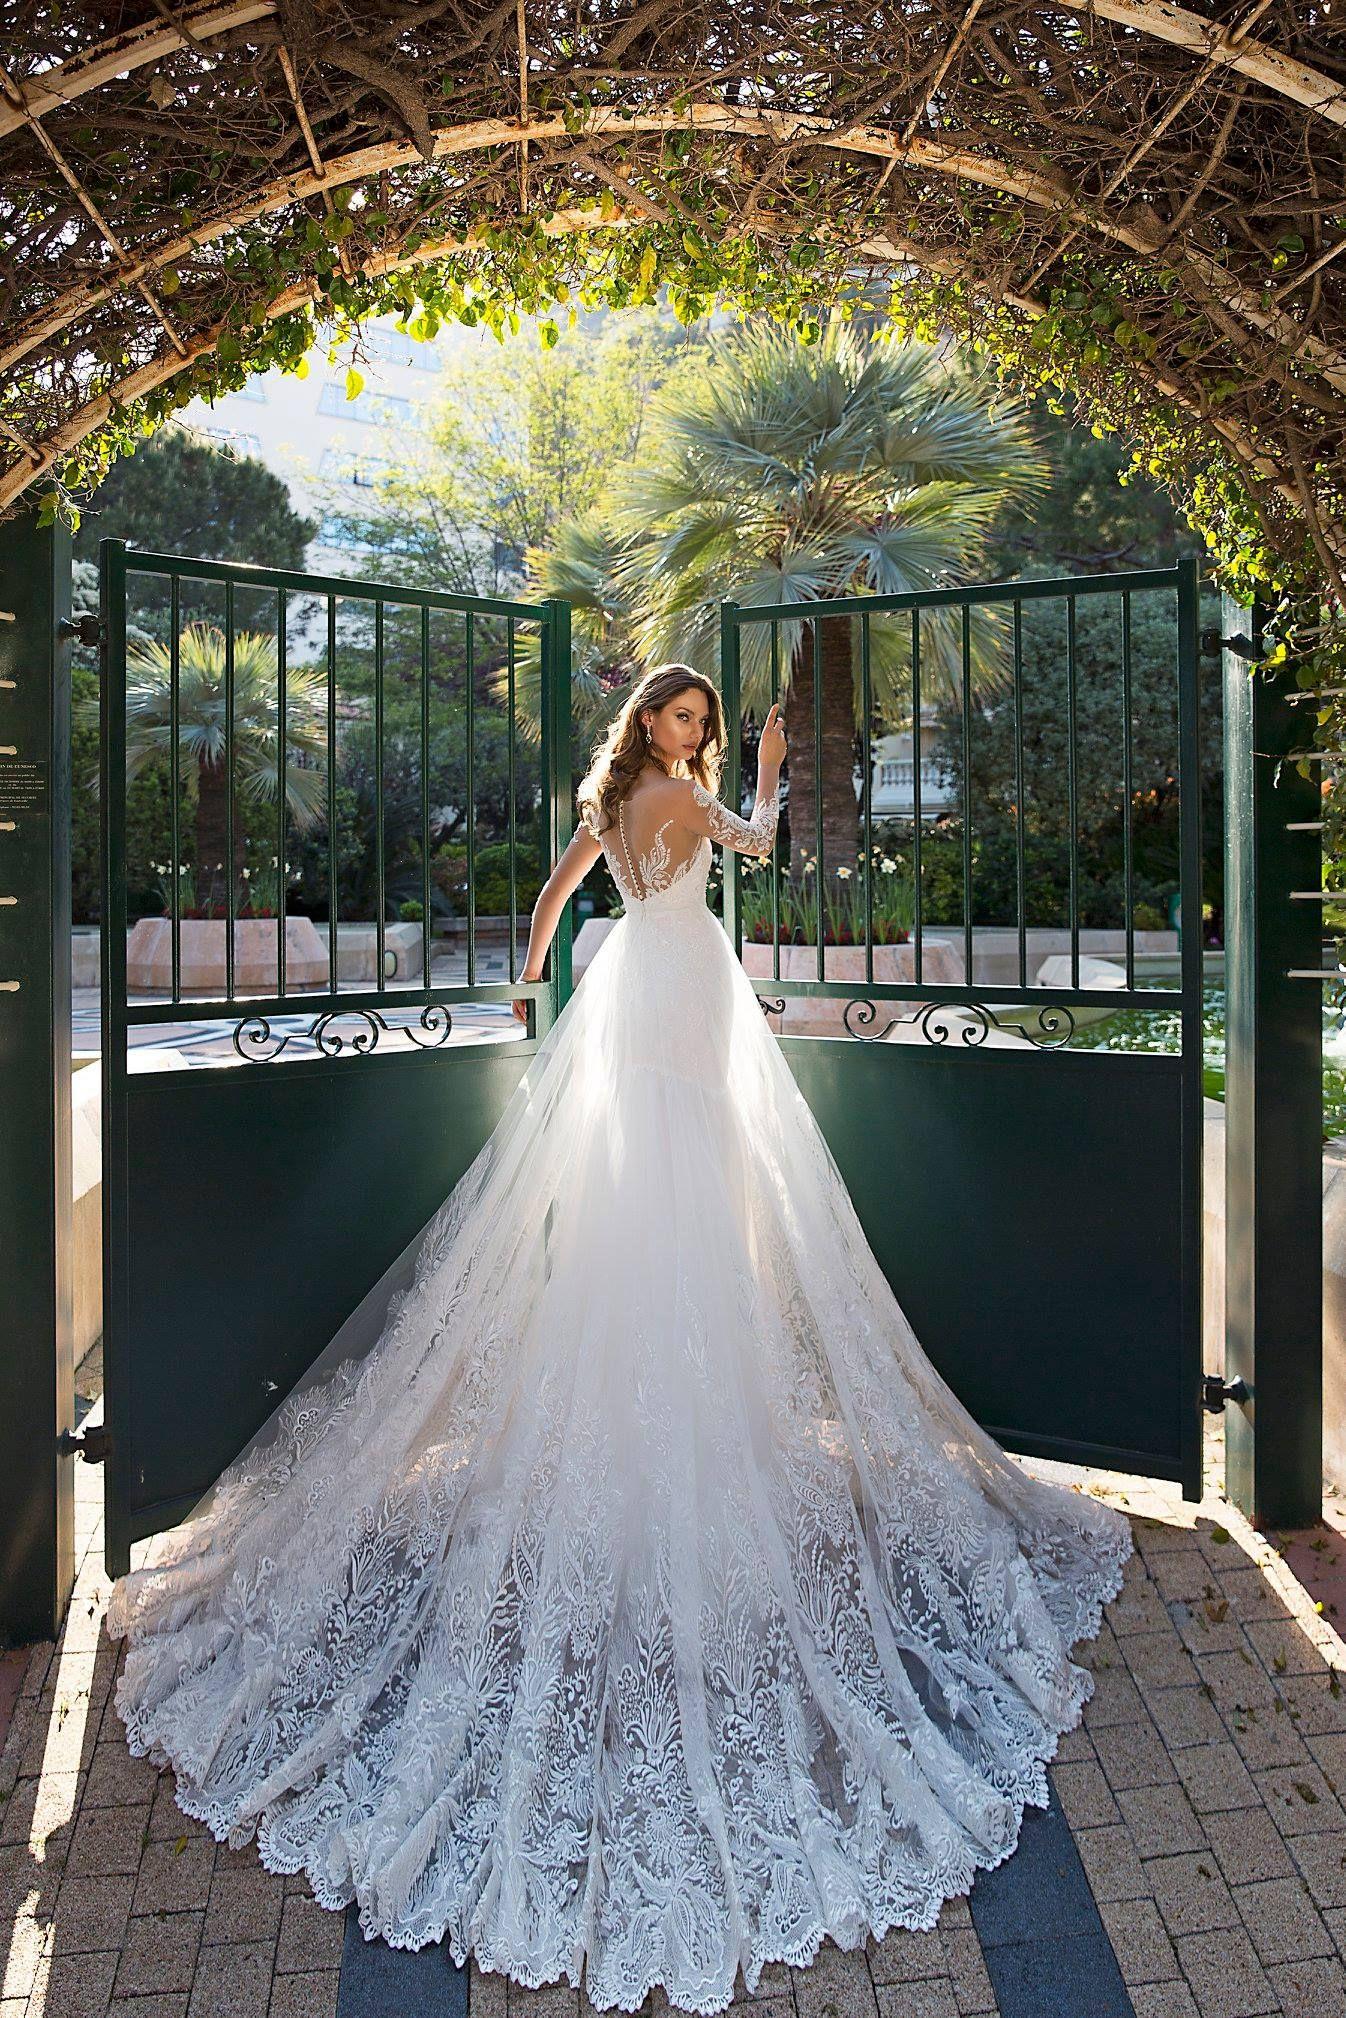 Wedding dresses by TINA VALERDI BARCELONA ONLY at Charmé Gaby ...